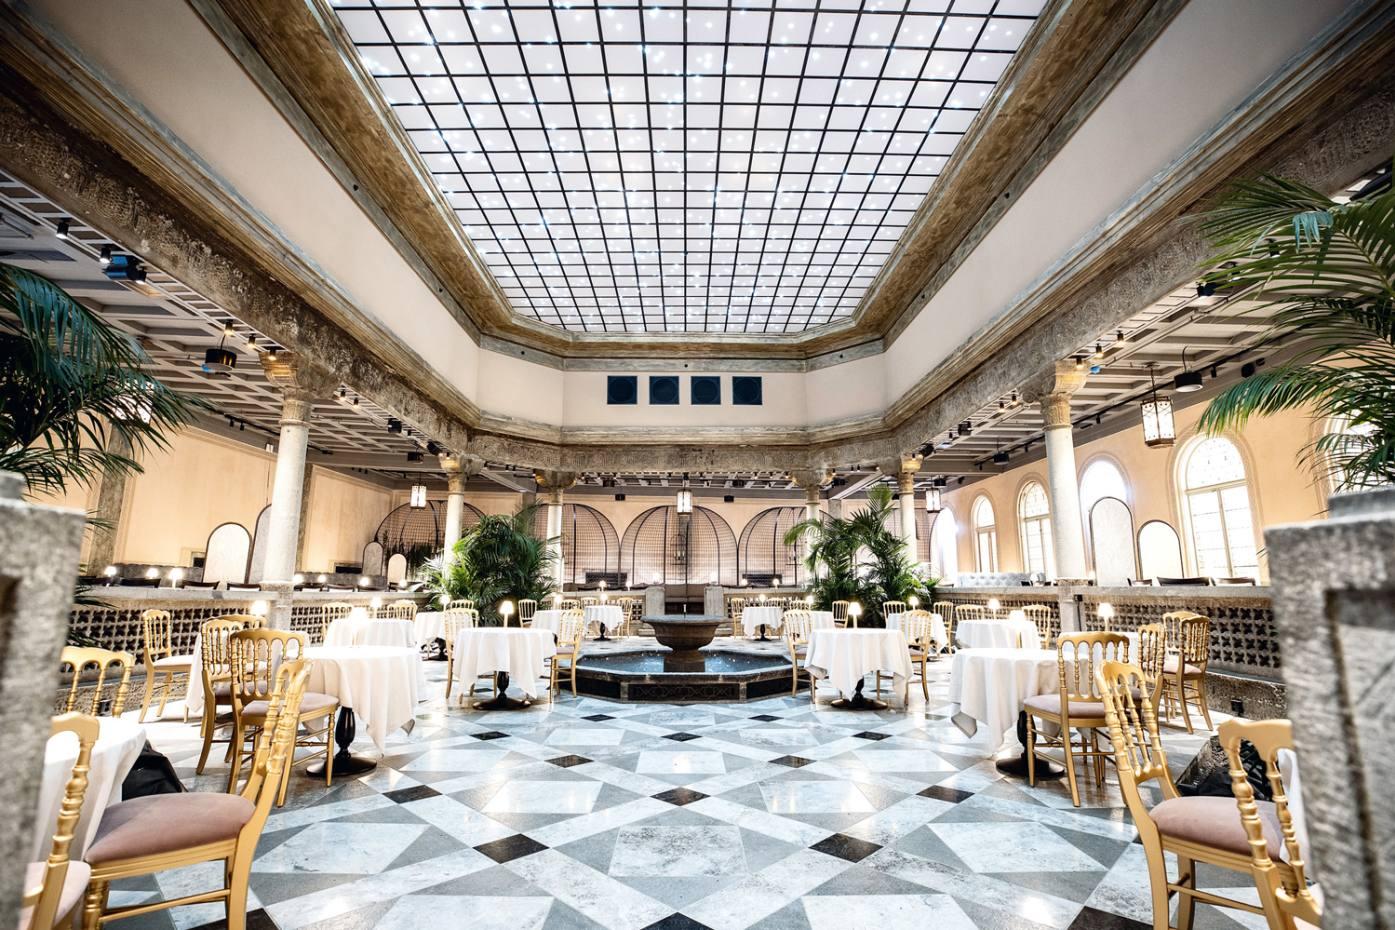 One of the six restaurants inTrondheim's fabulously restored Britannia hotel